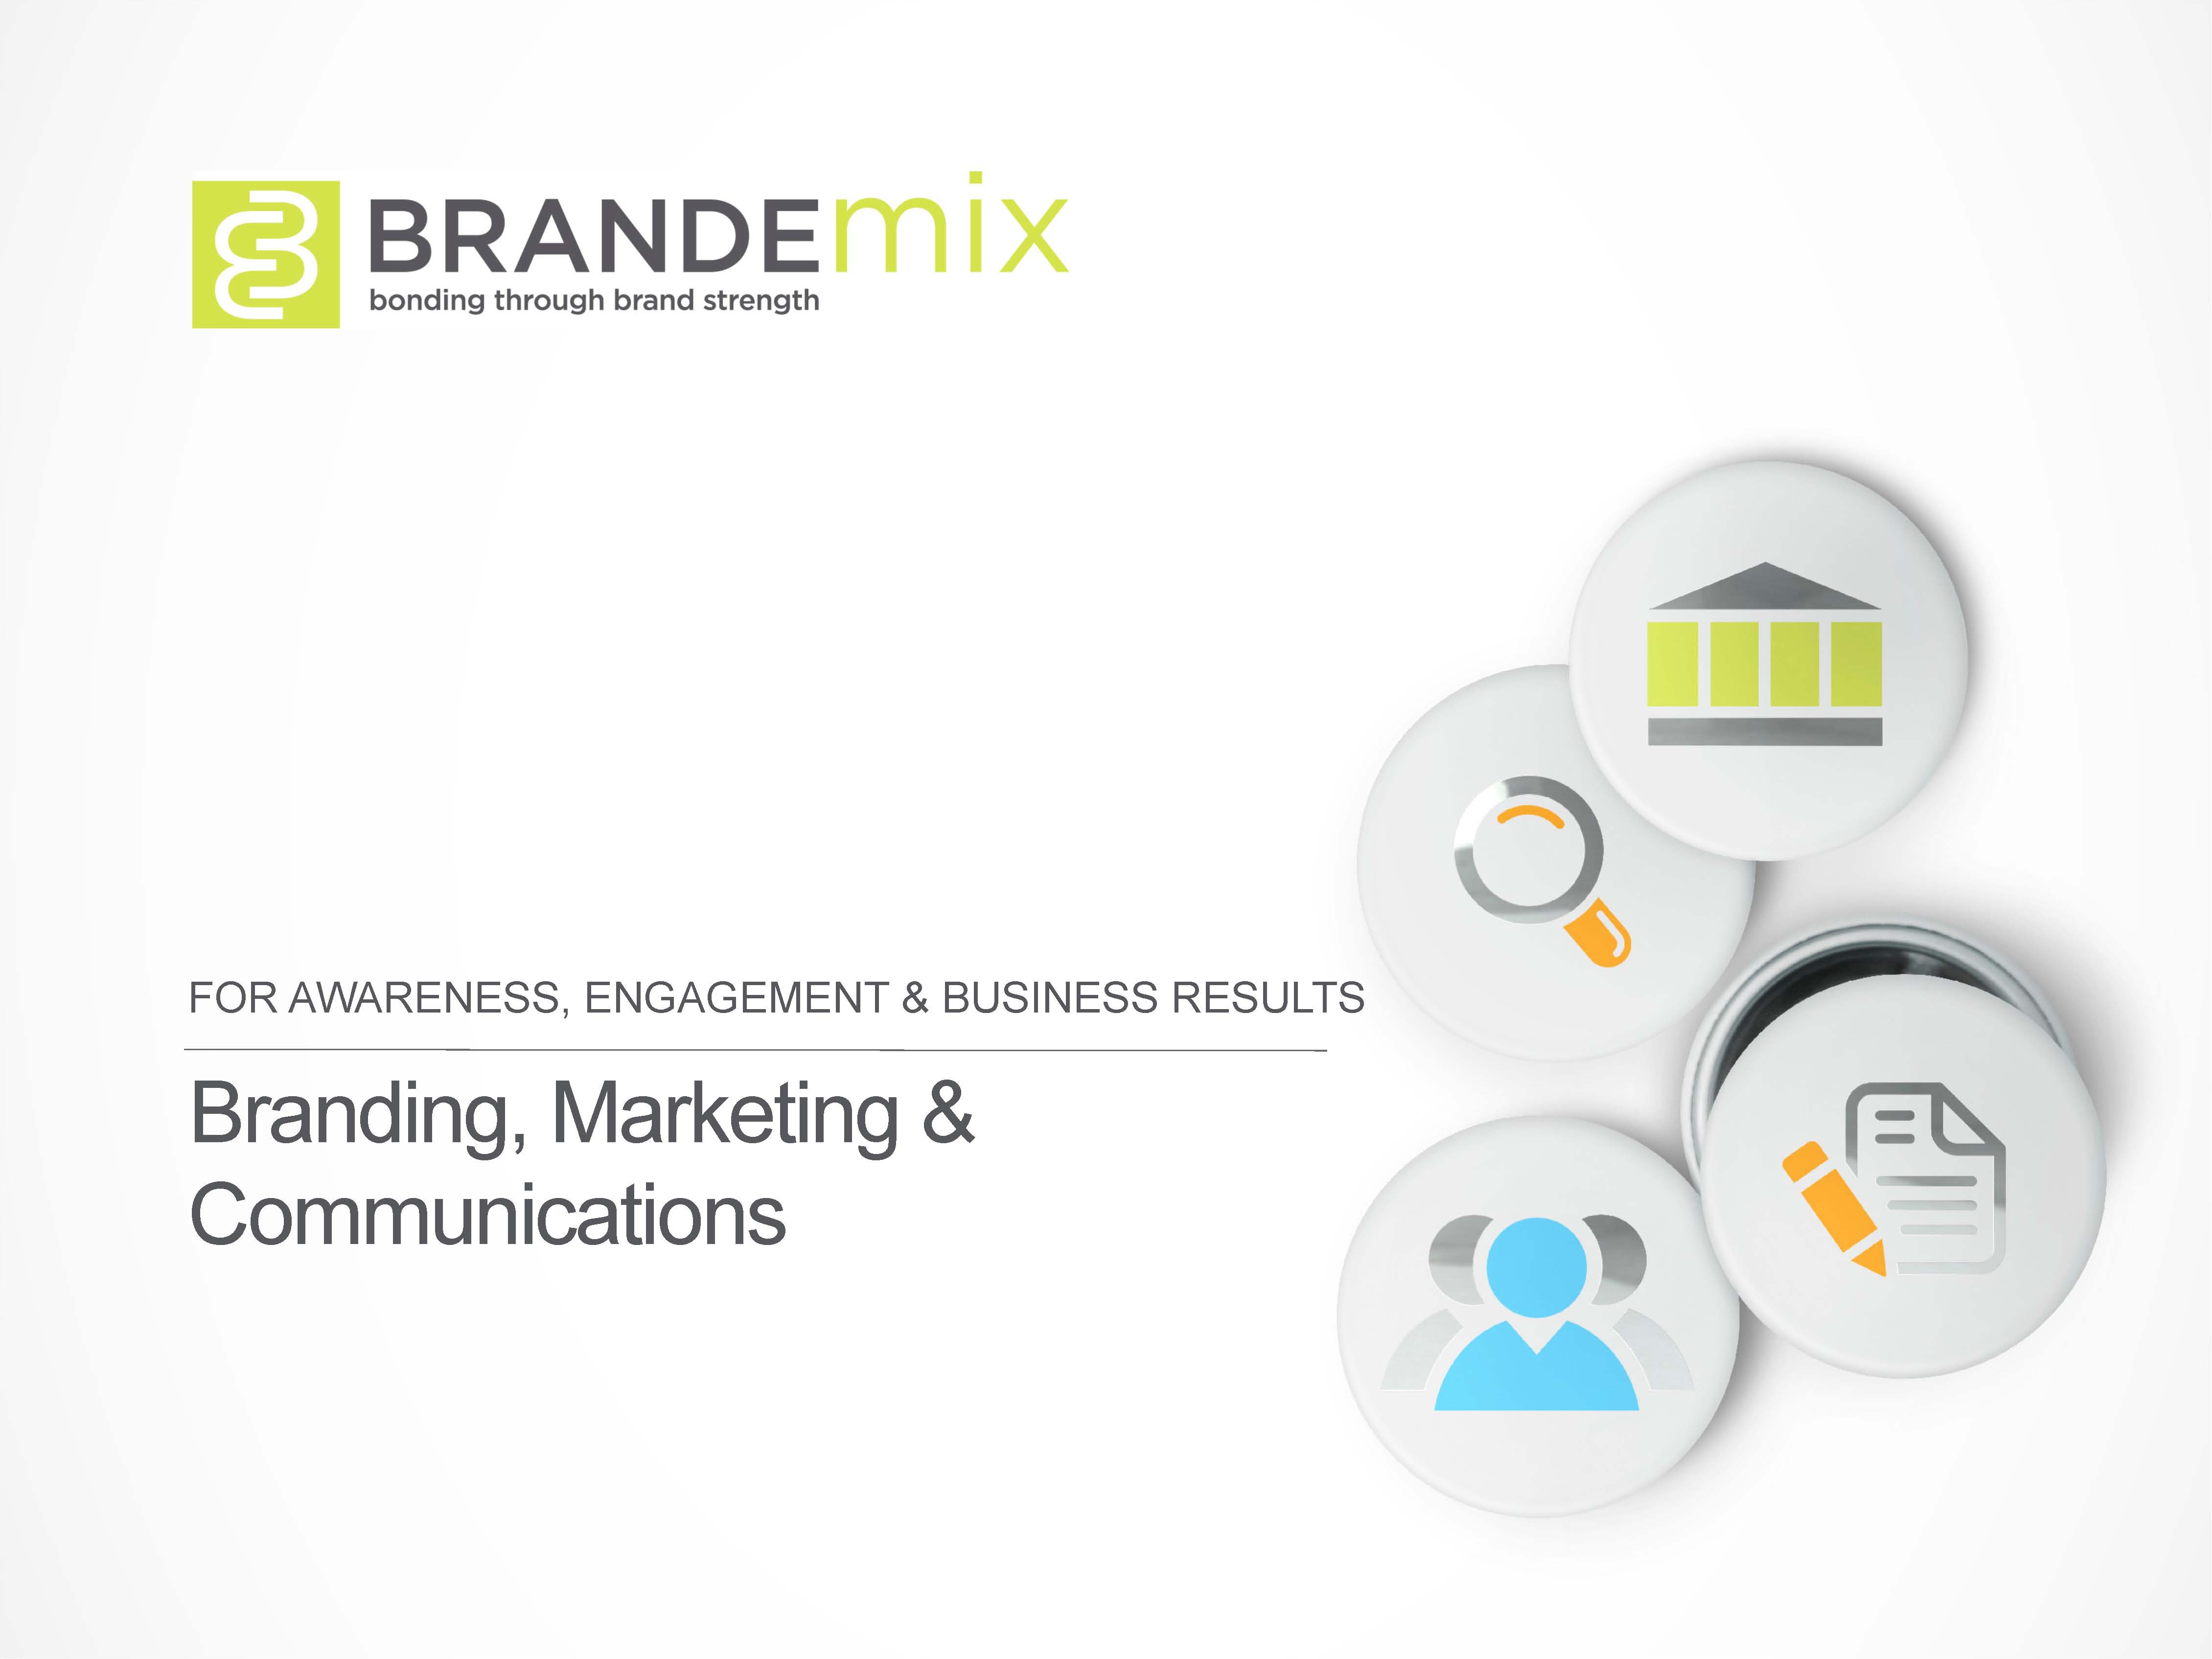 Brandemix Branding, Marketing and Communications